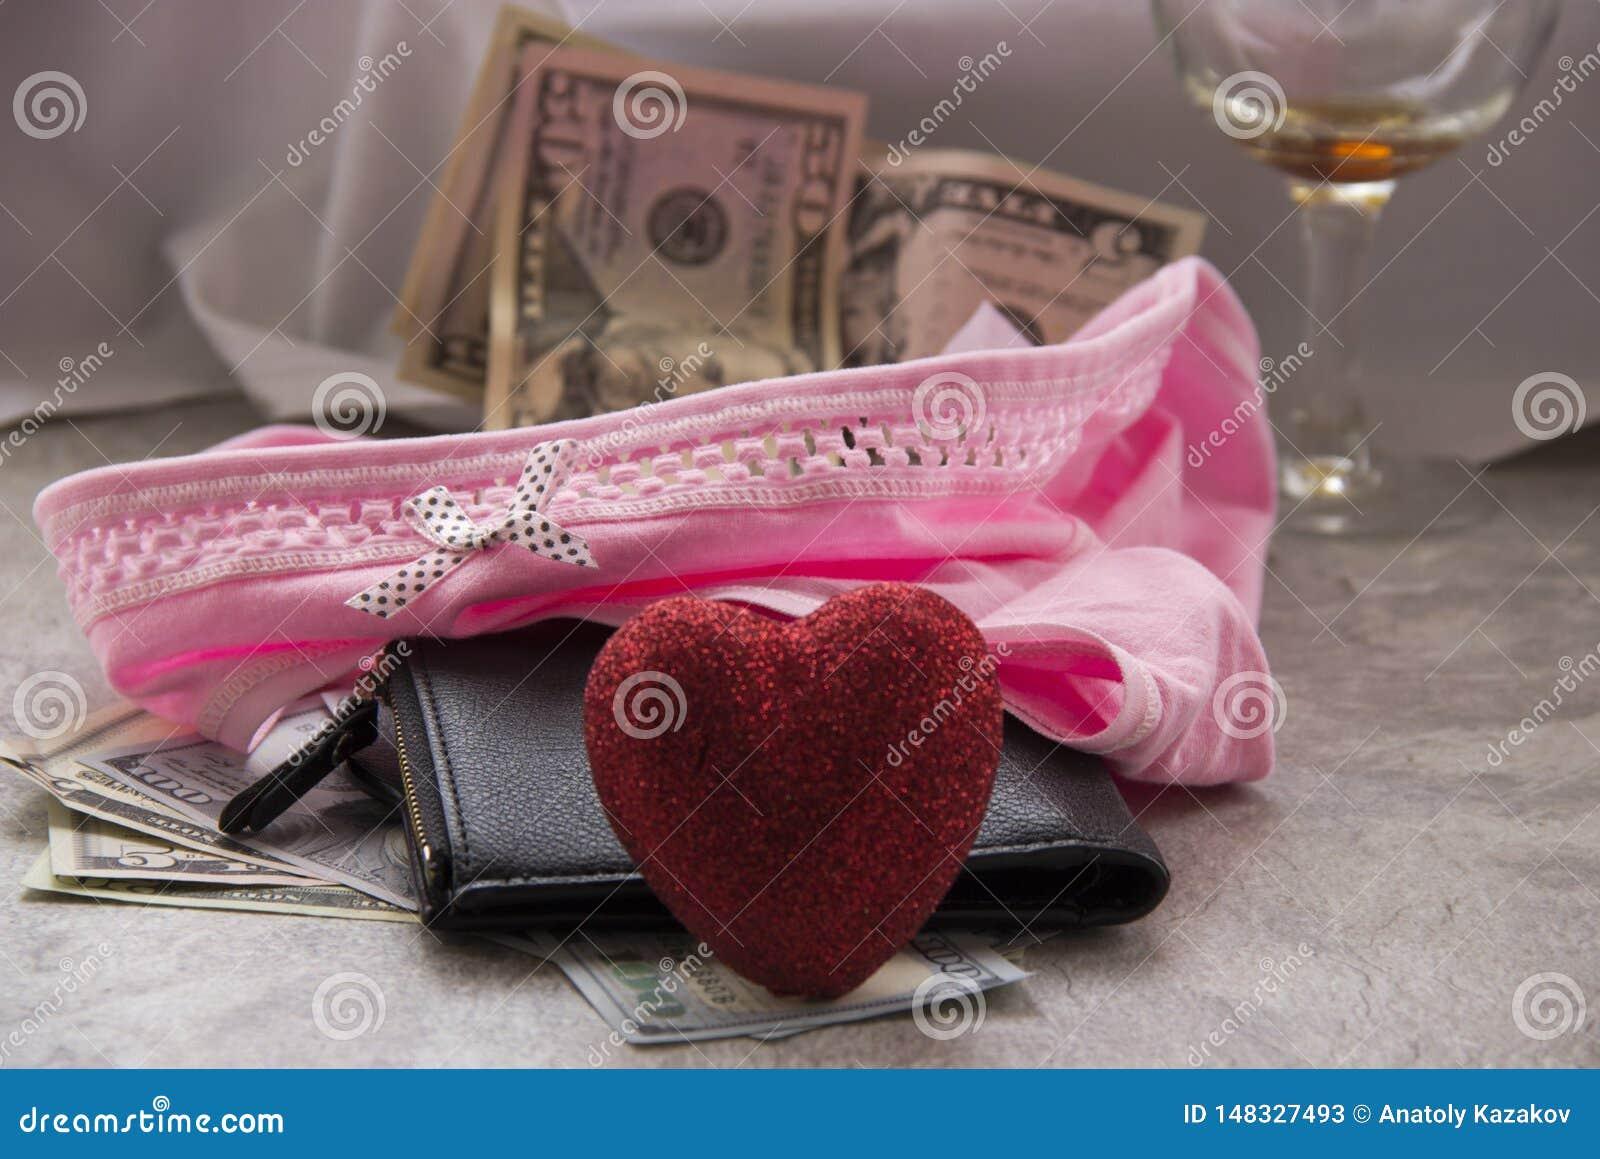 F?r?lskelse f?r pengar ?r prostitution Ett skrynkligt ark, ett exponeringsglas av vin och pengar i hennes underkl?der ?r k?nsbest